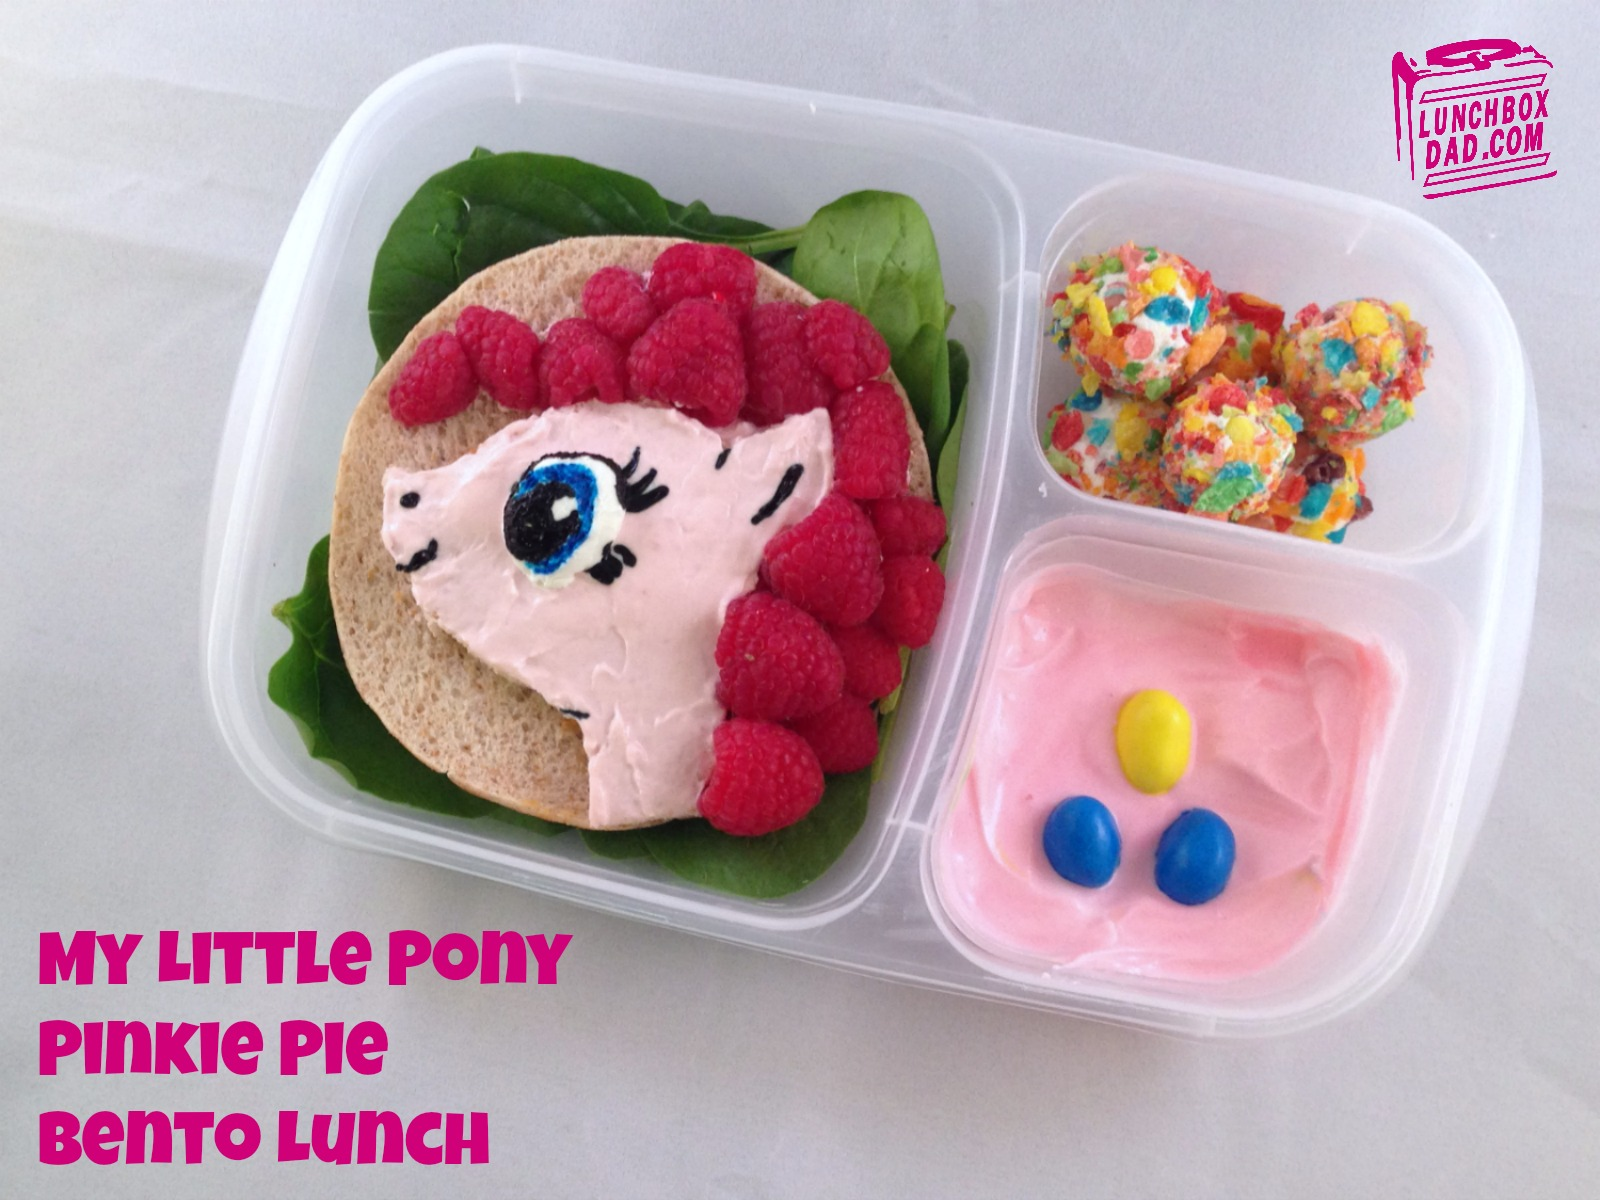 My Little Pony Pinkie Pie Lunch